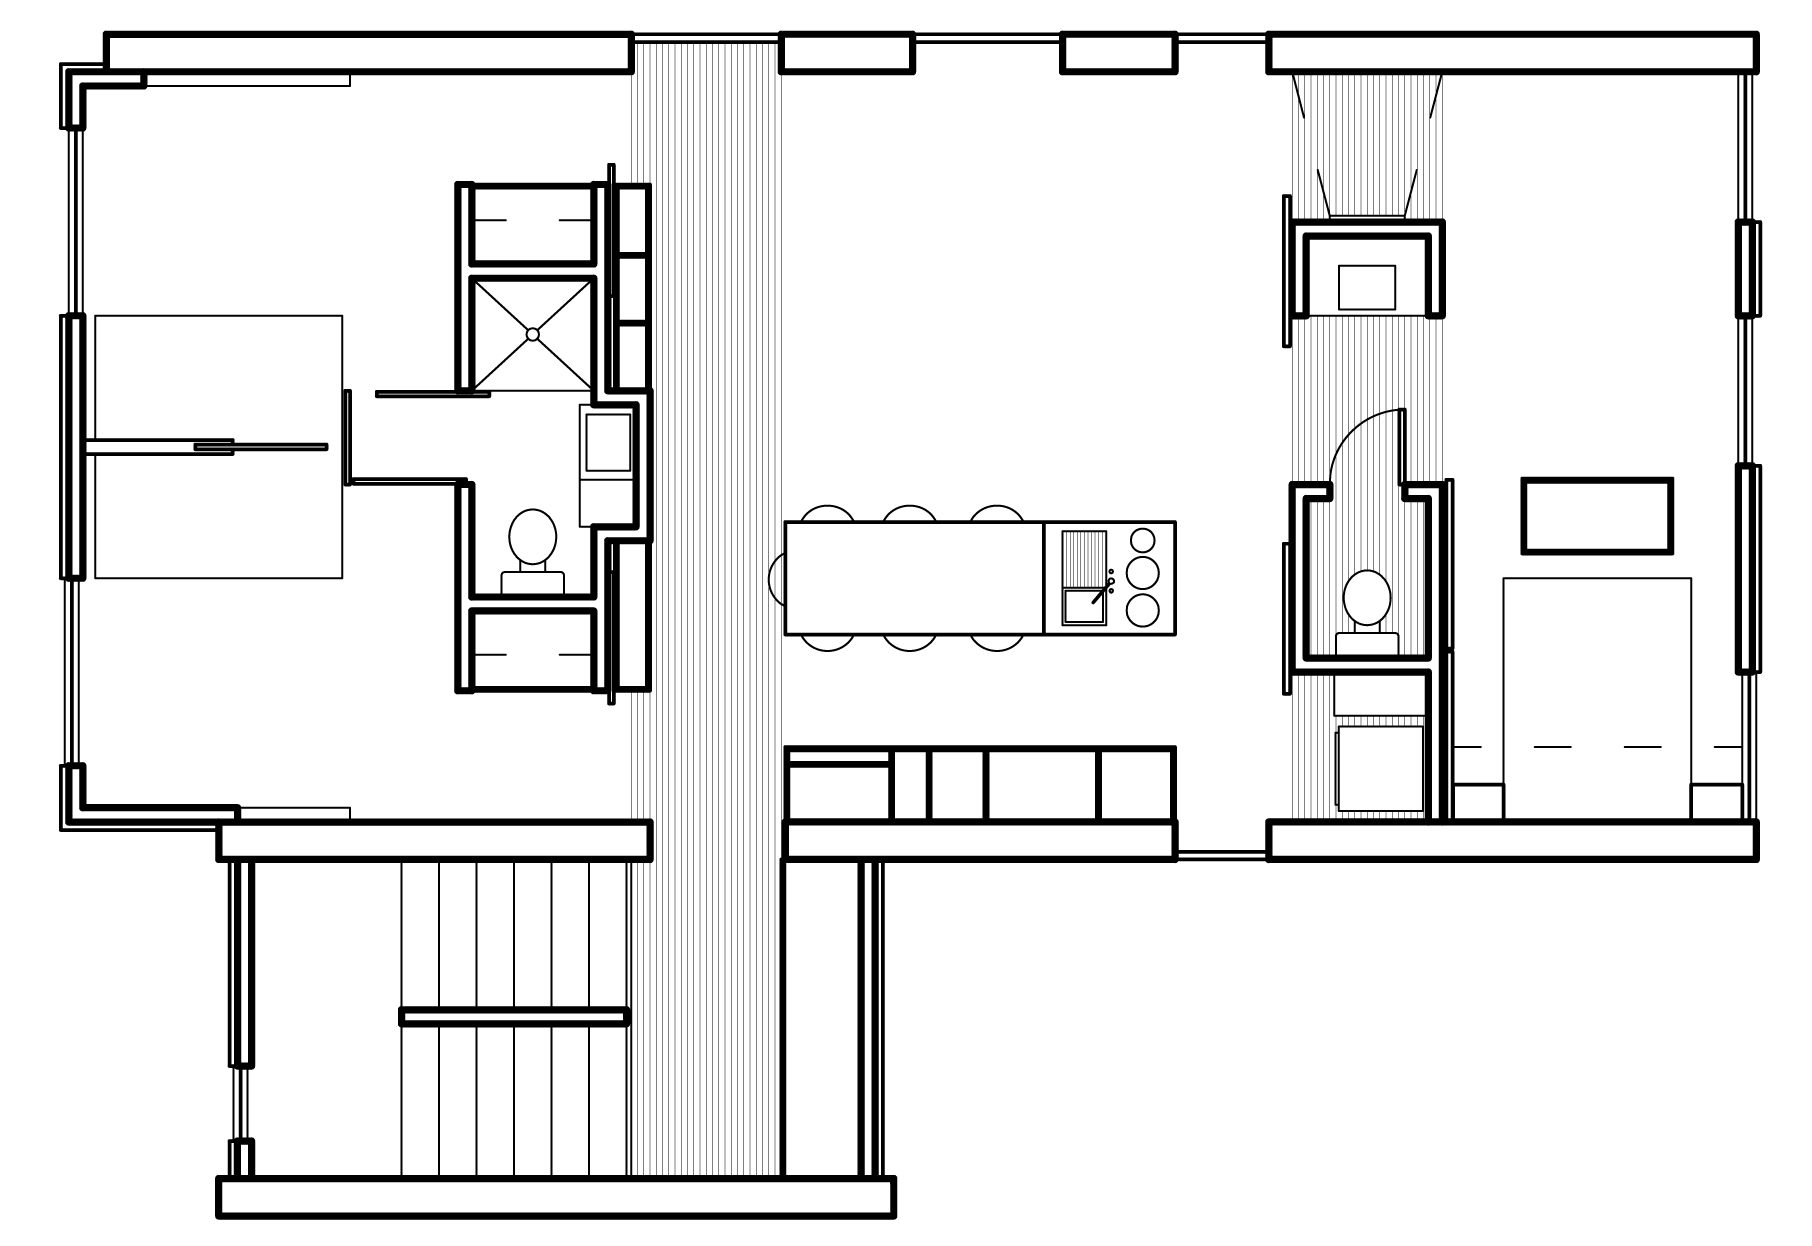 19 Best Simple Floor Plans For Small Houses Modern Ideas